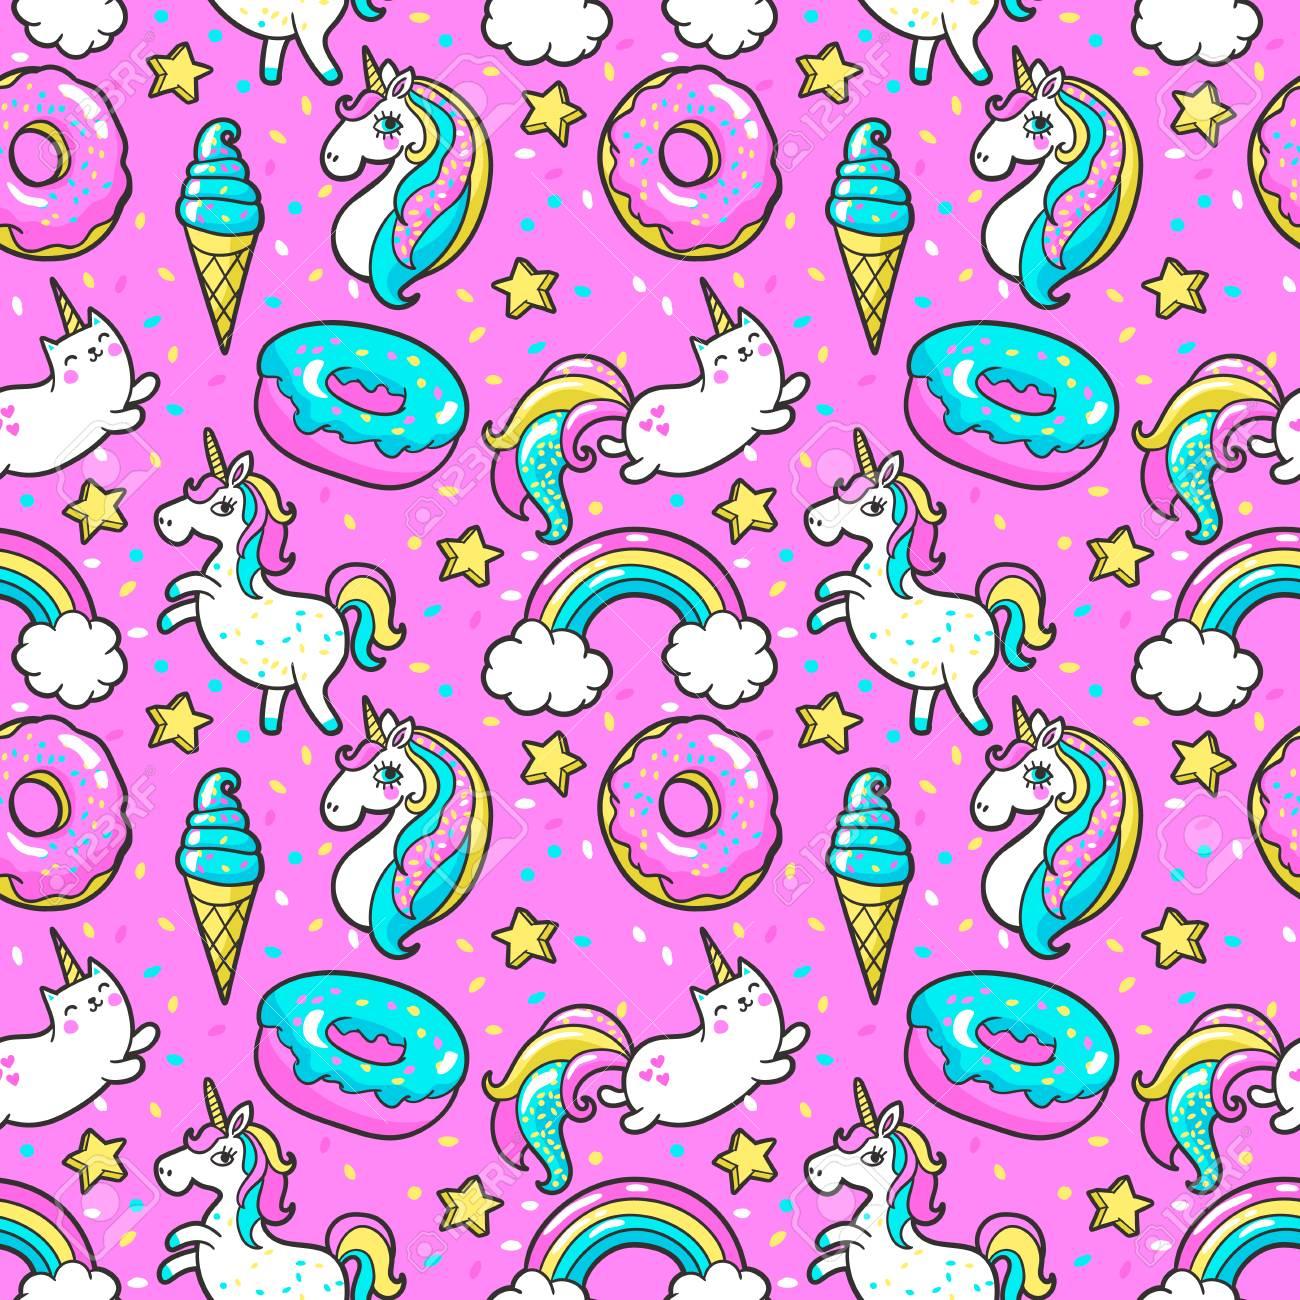 Seamless pattern in cartoon 80s-90s comic style. - 81122496